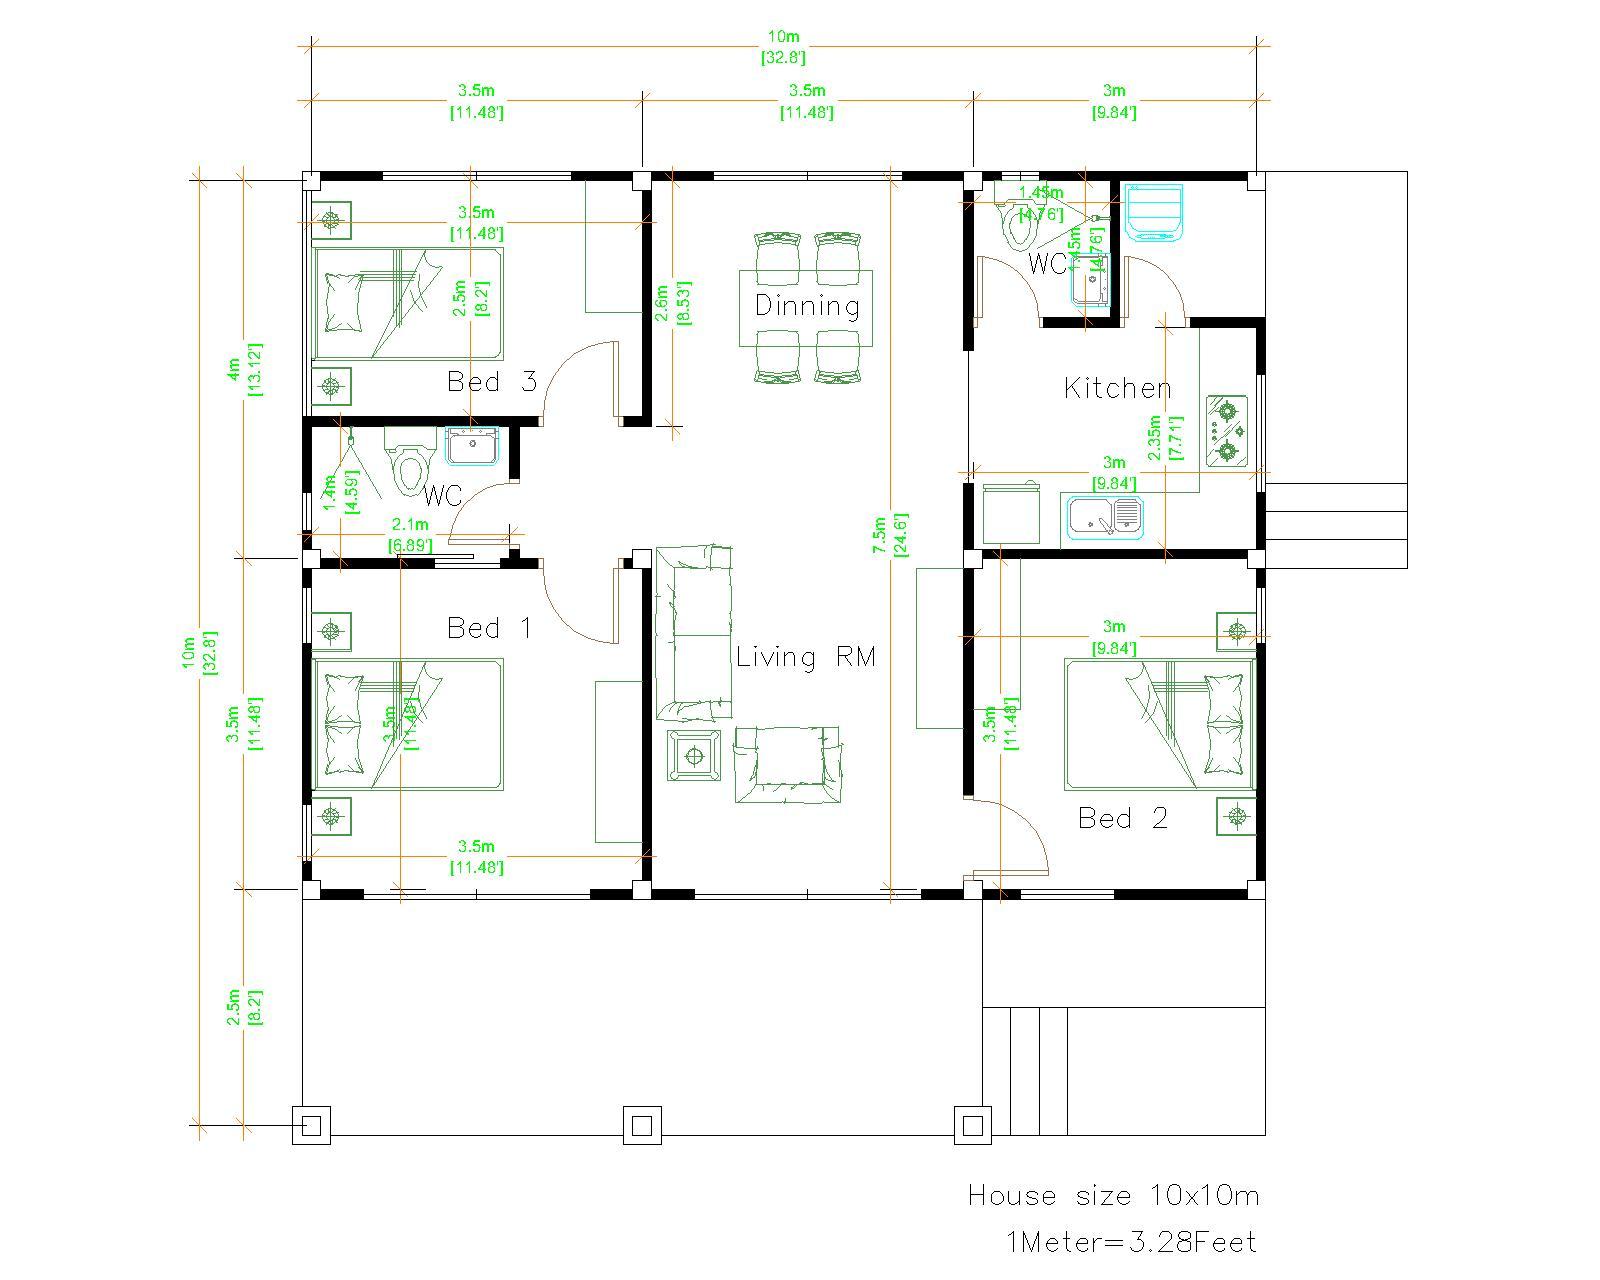 3 Bedroom House Plans 10x10 Meter 33x33 Feet layout floor plan